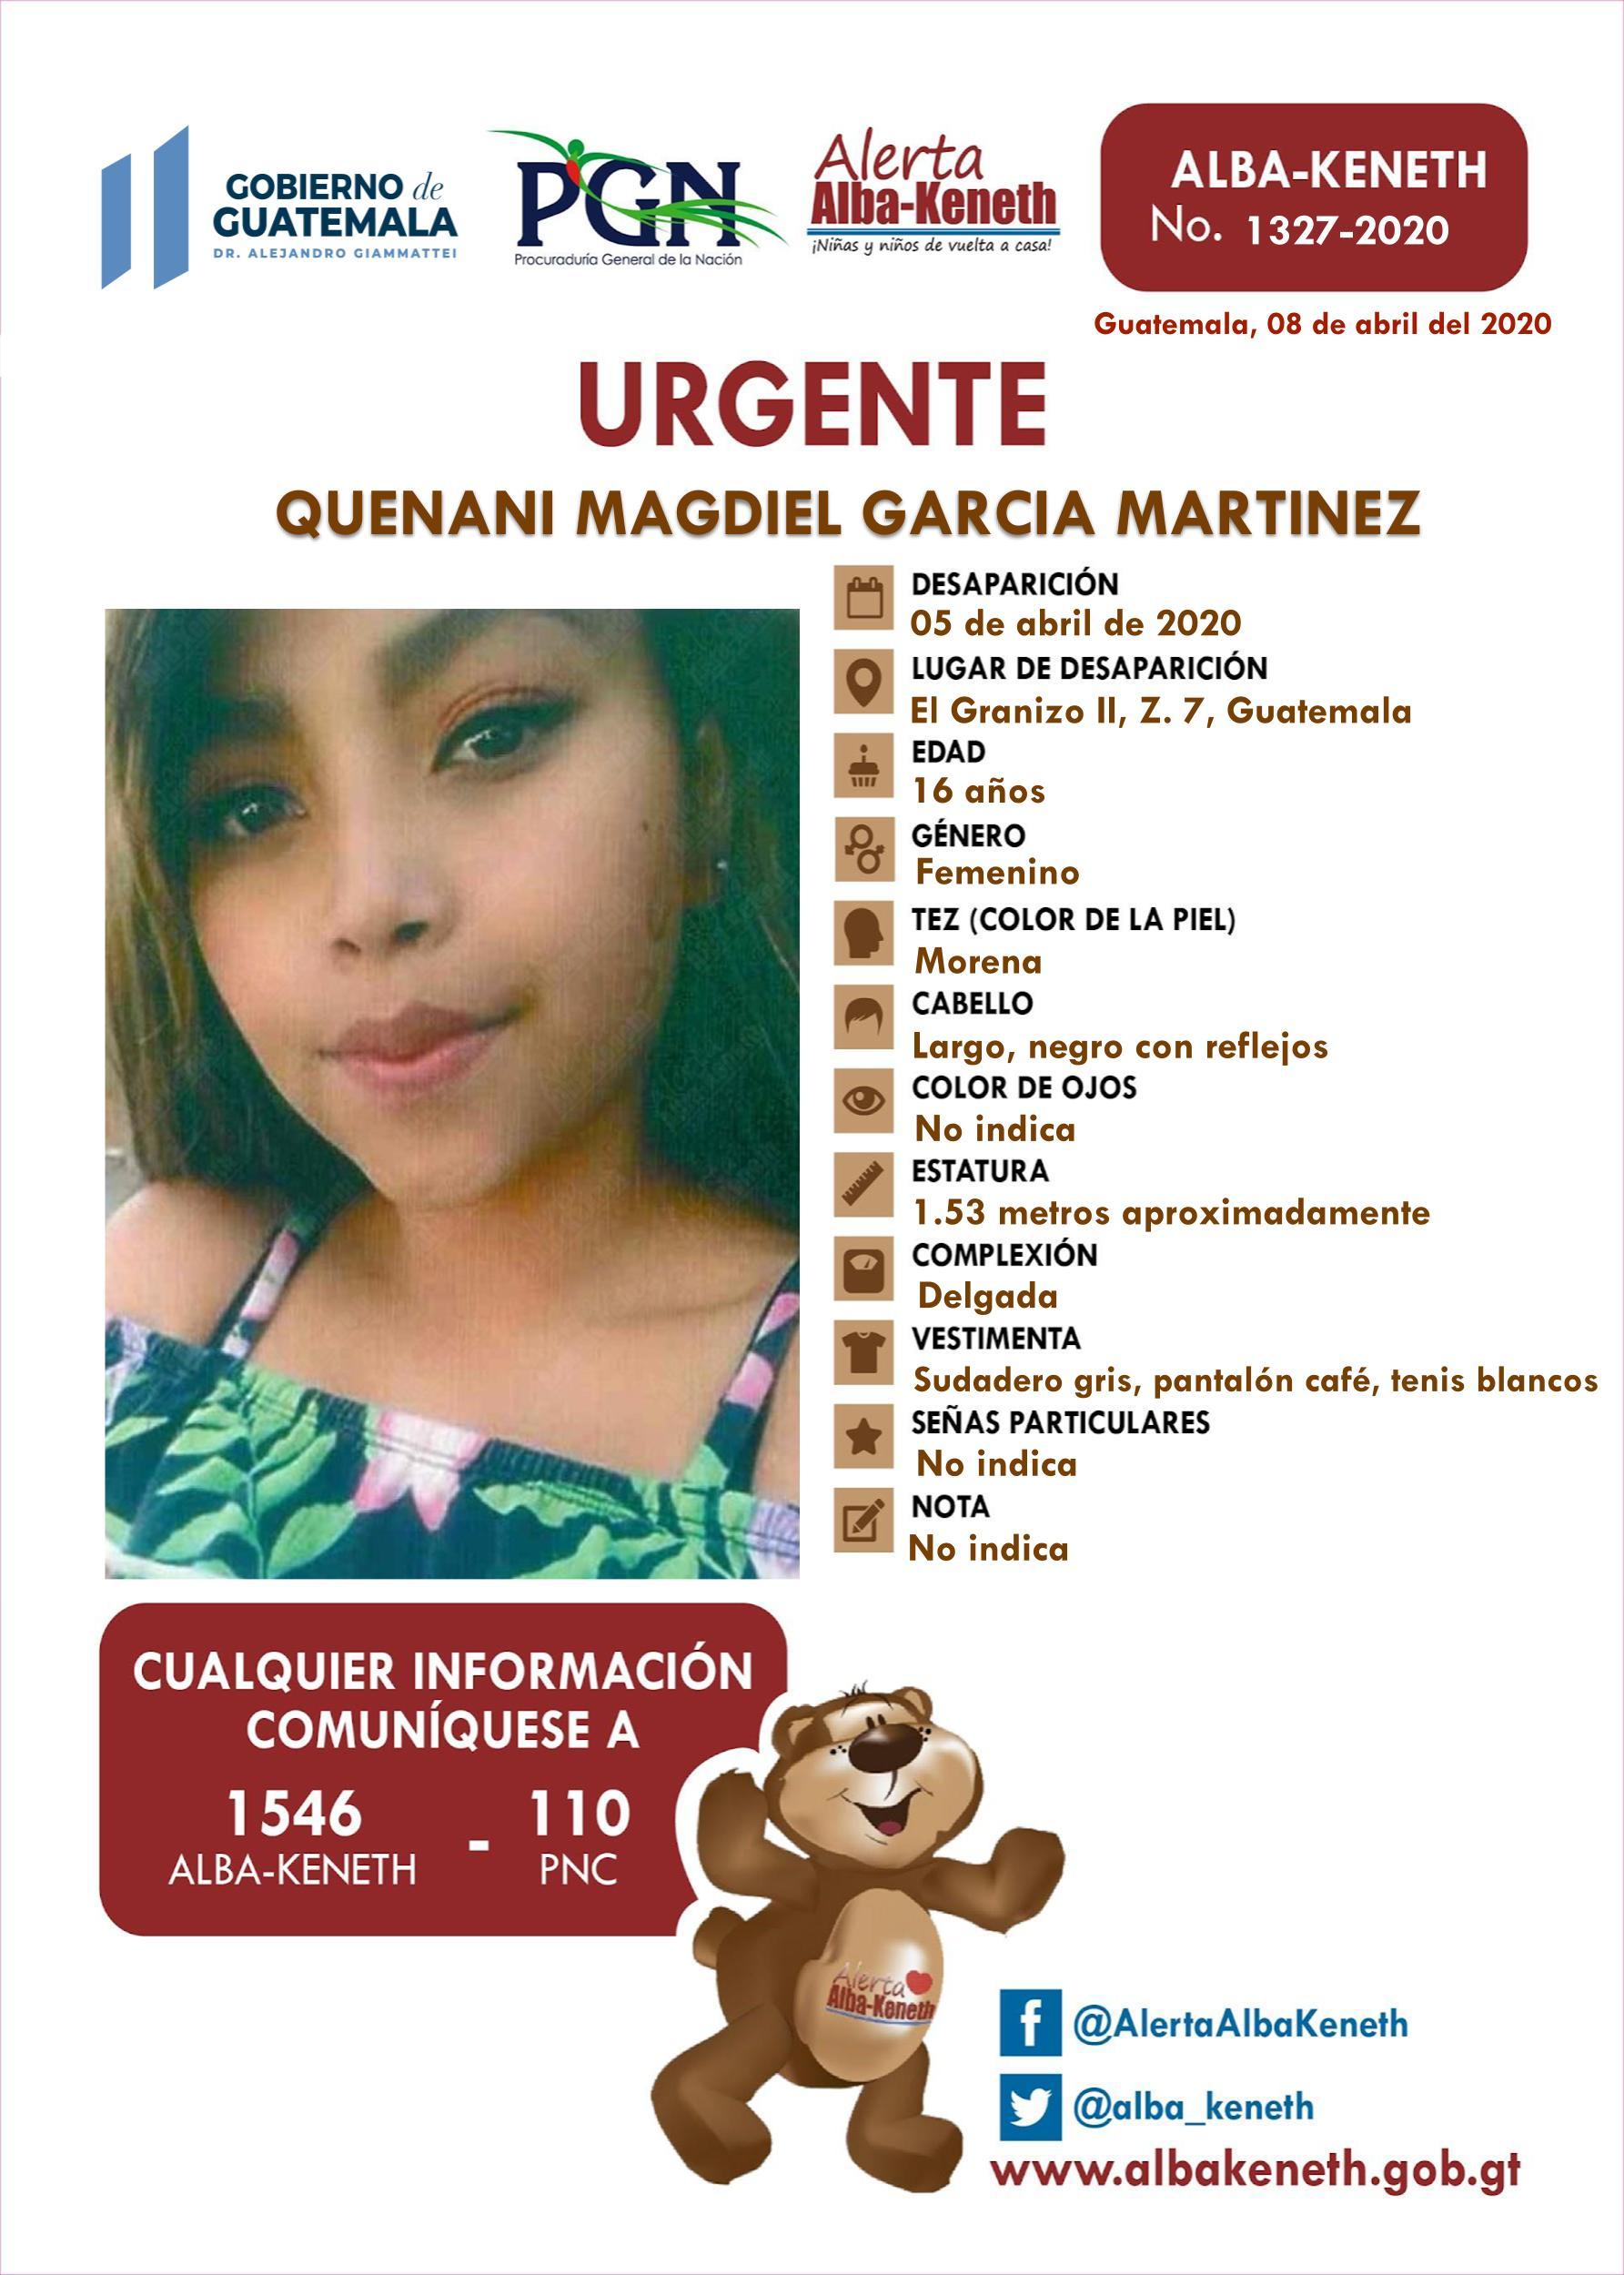 Quenani Magdiel Garcia Martinez